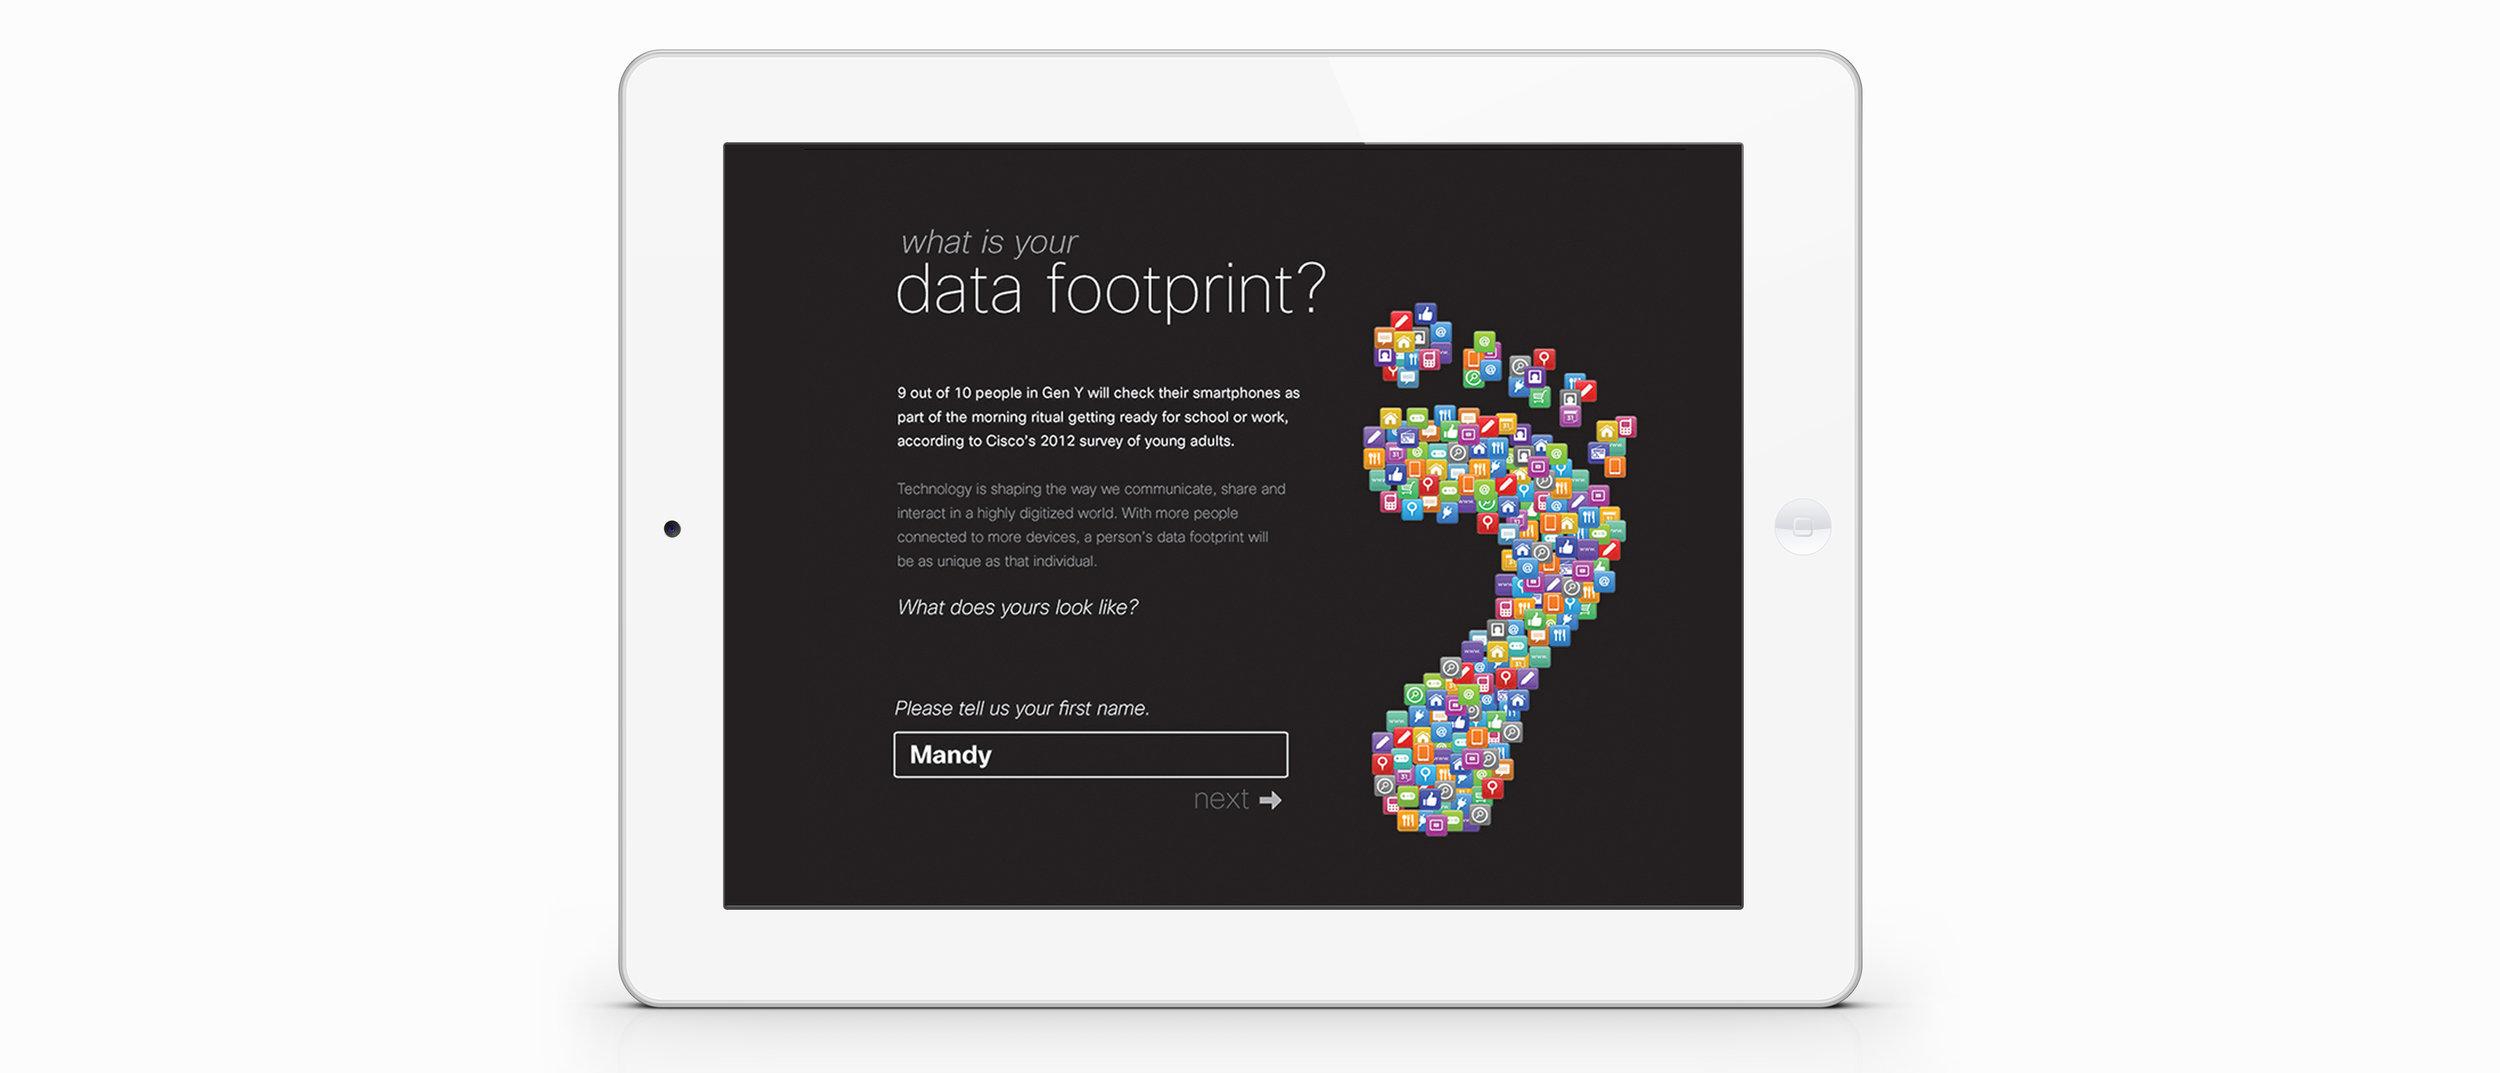 Footprint_iPad_2 copy.jpg